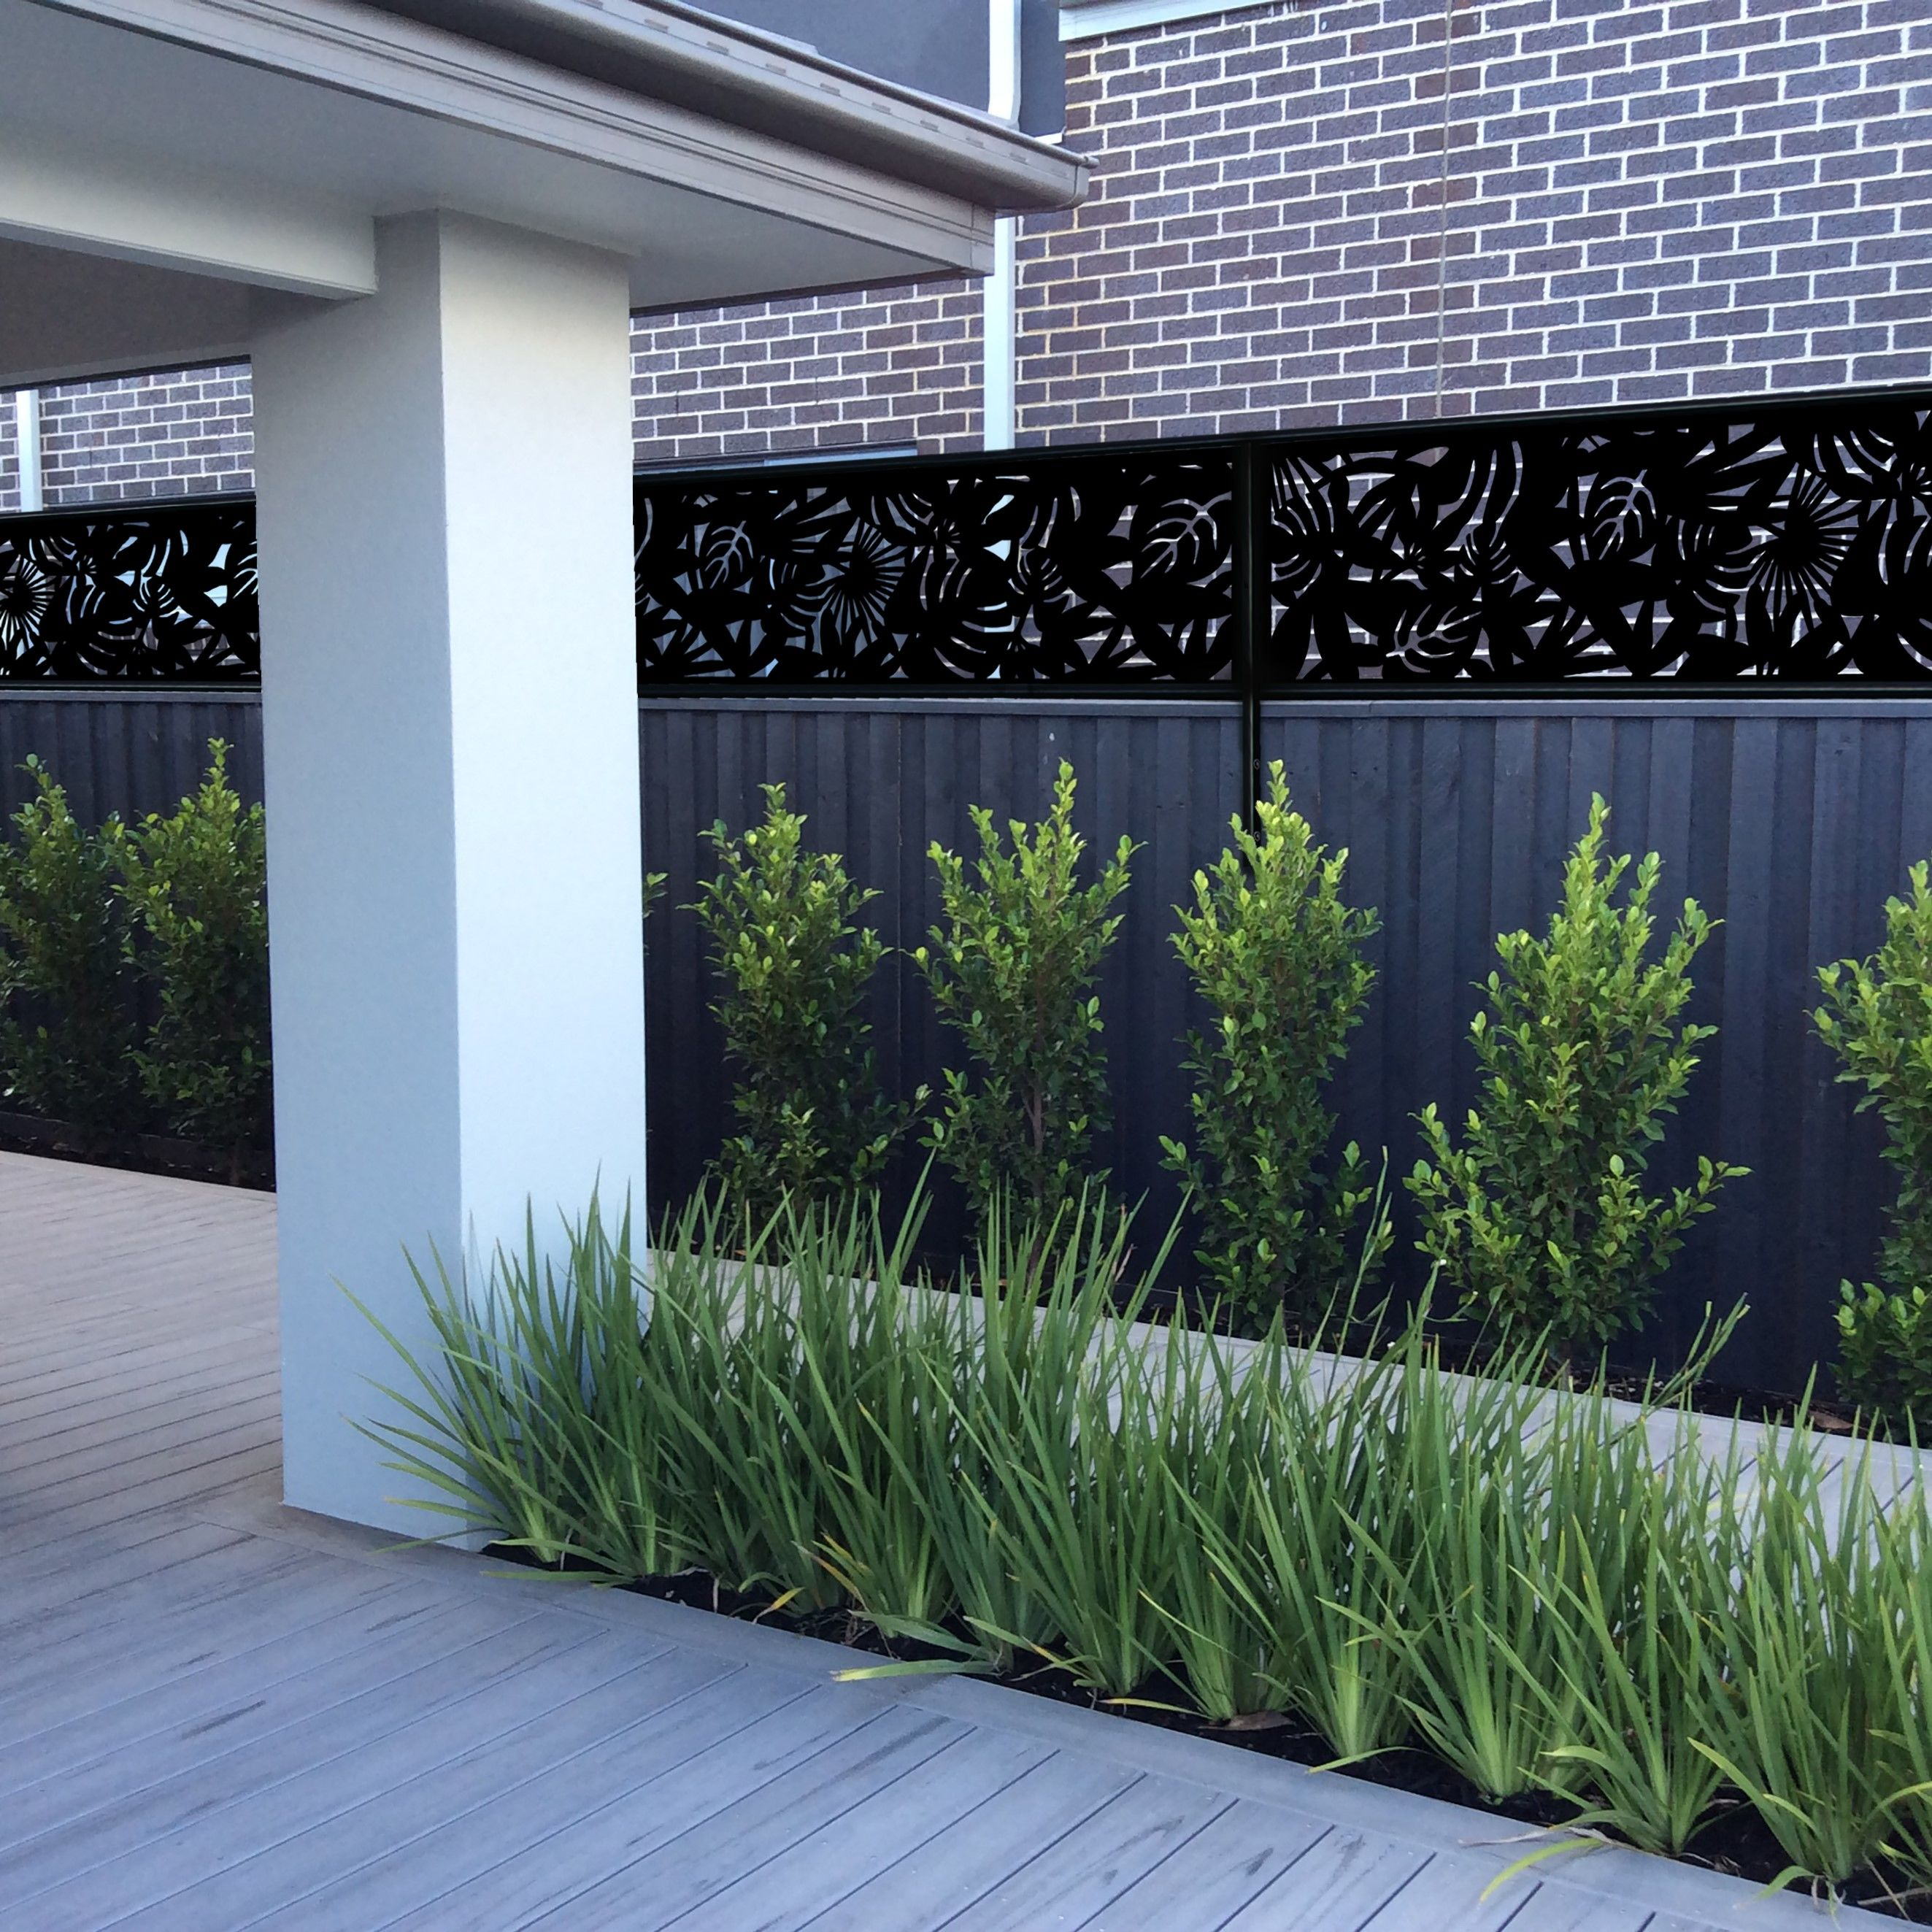 Design Flow - Australian manufacturer of Matrix fence extensions